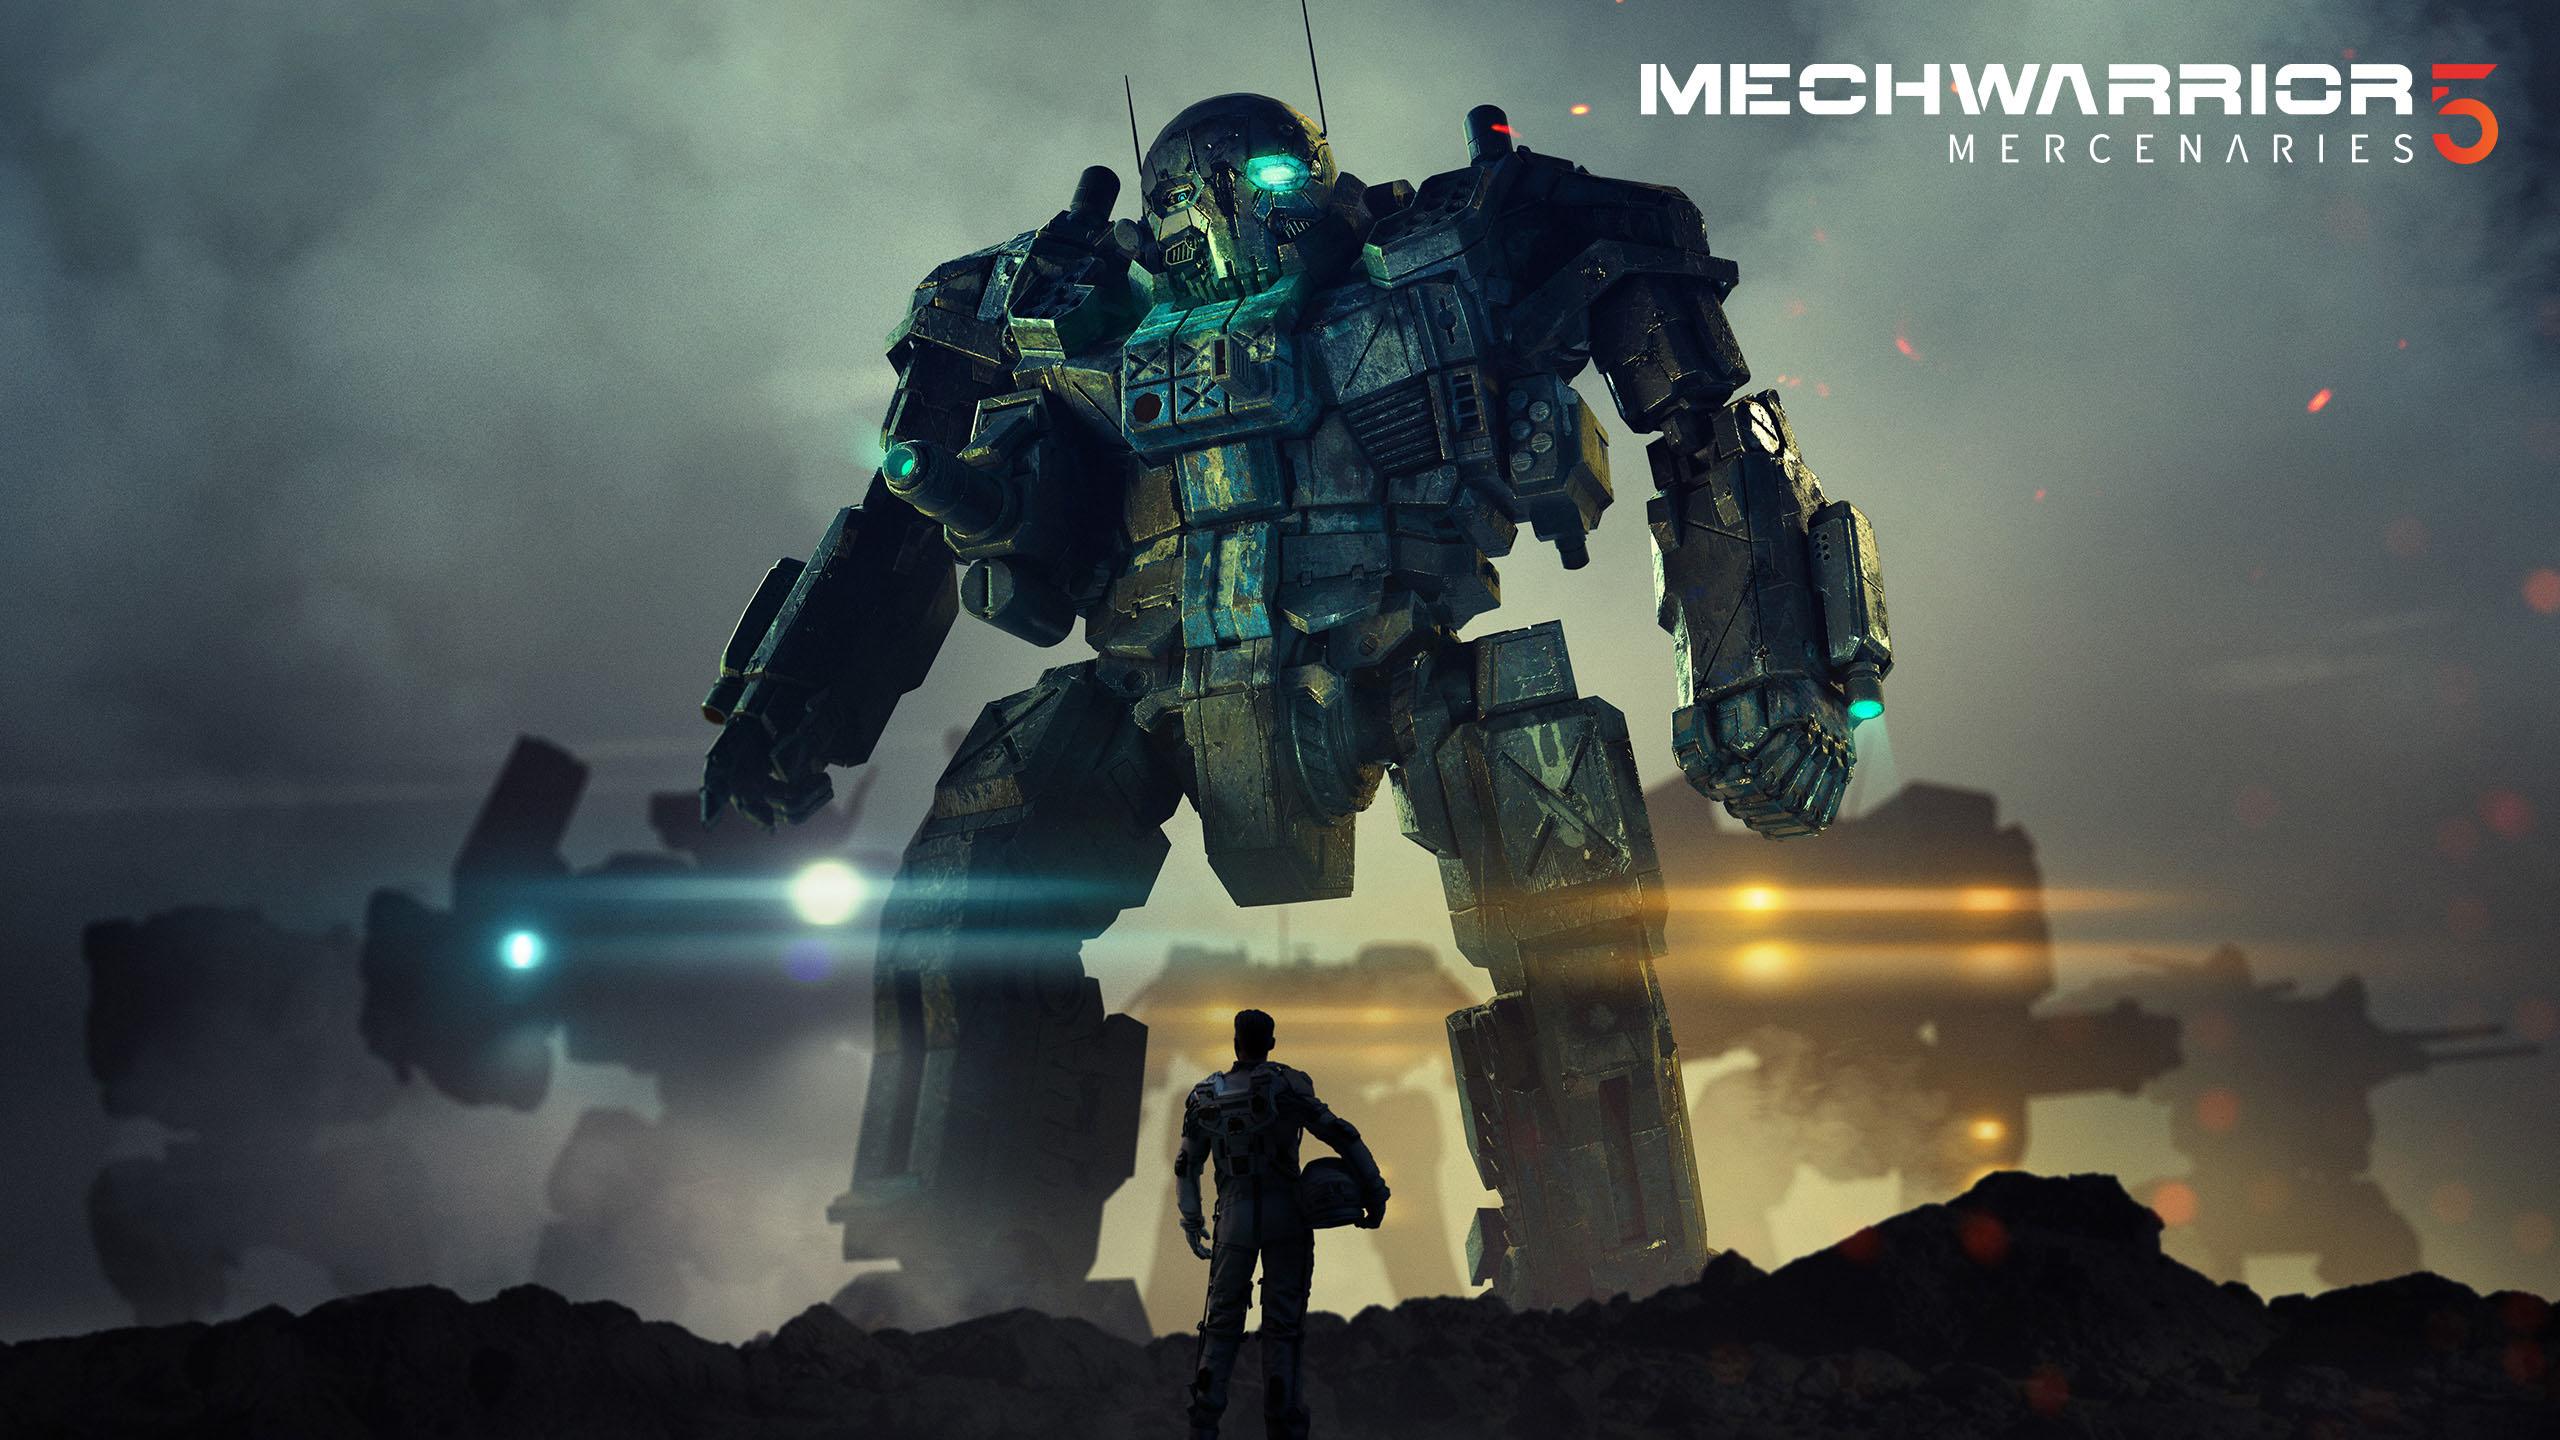 4k mechwarrior 5 mercenaries wallpaper 75235